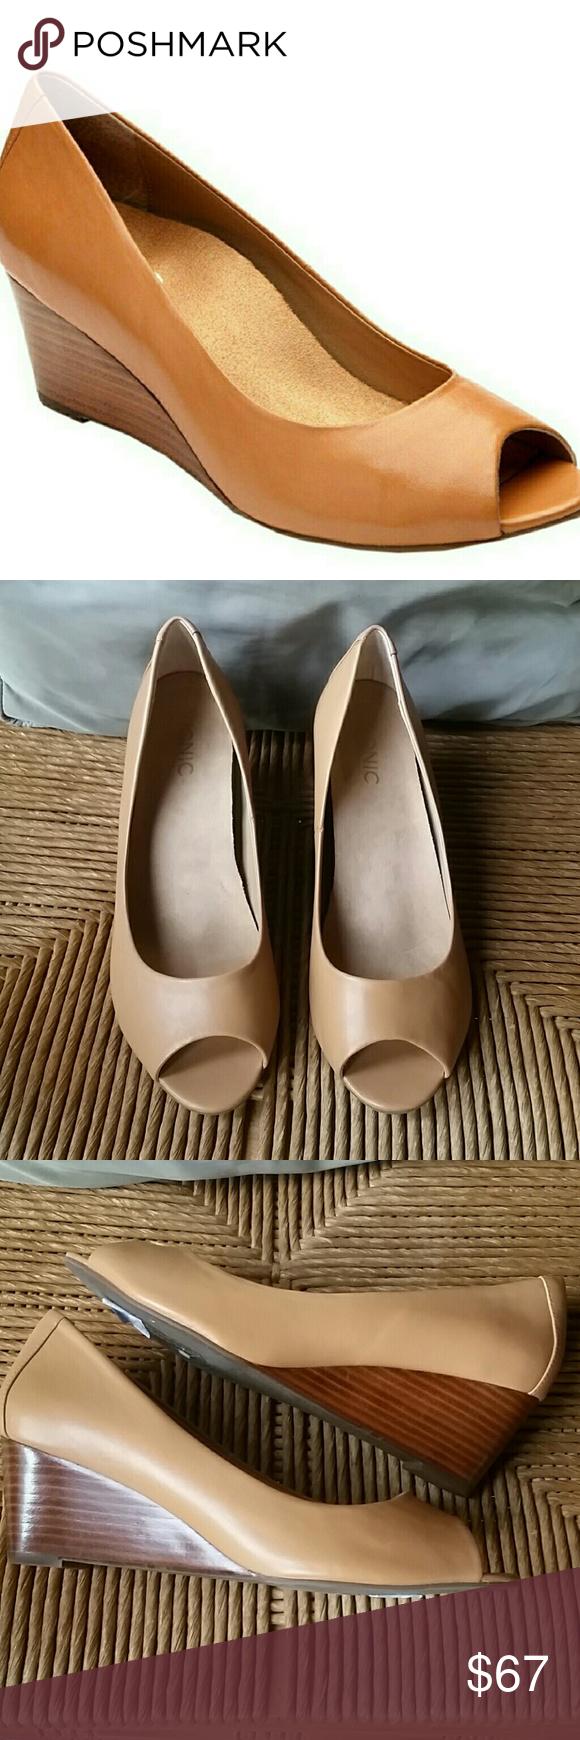 Vionic Bria peep toe, size 8.5, caramel